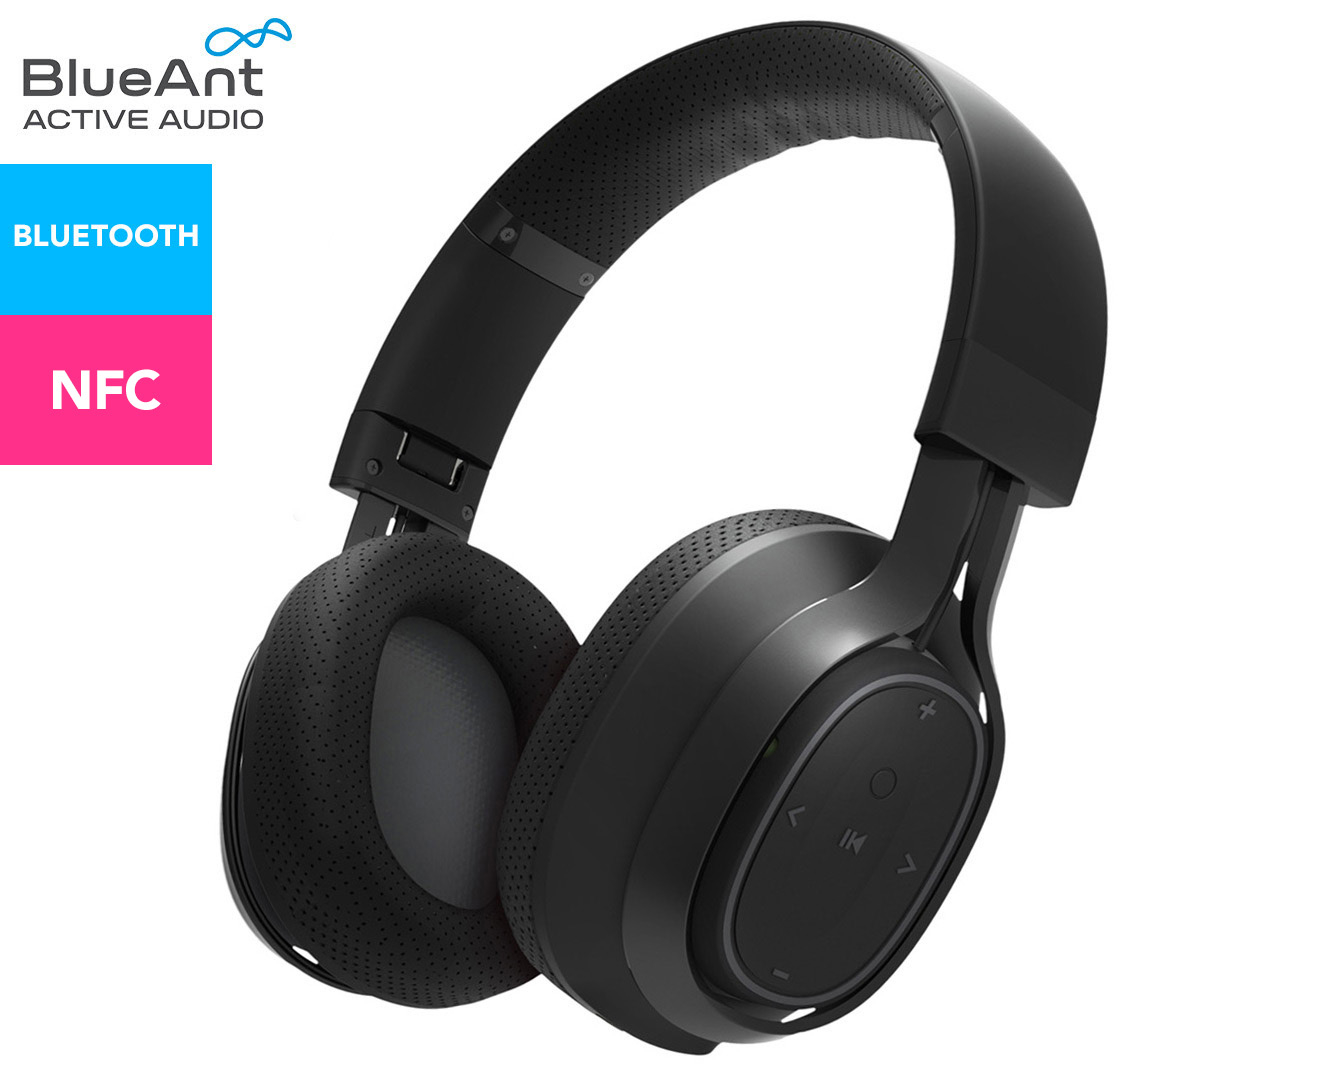 c99ce9cc5ac Blueant Pump Zone Wireless Headphones - Black   Catch.com.au